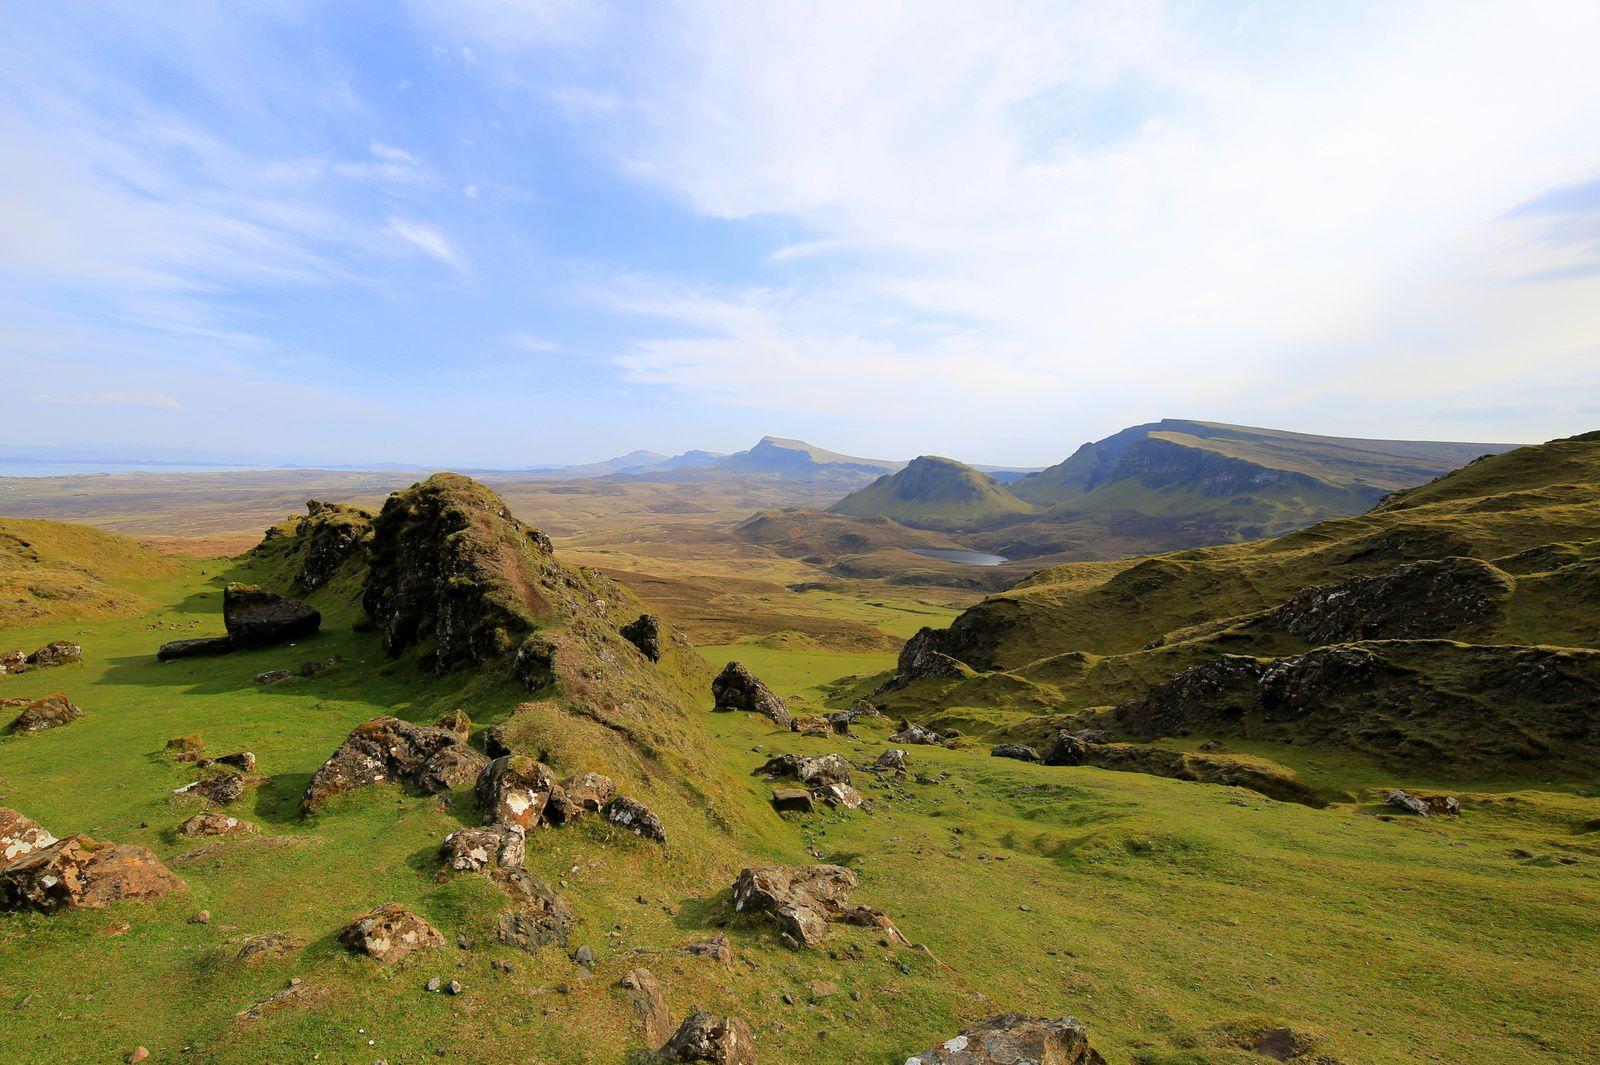 Skye Trail (Walkhighlands) - Scotland